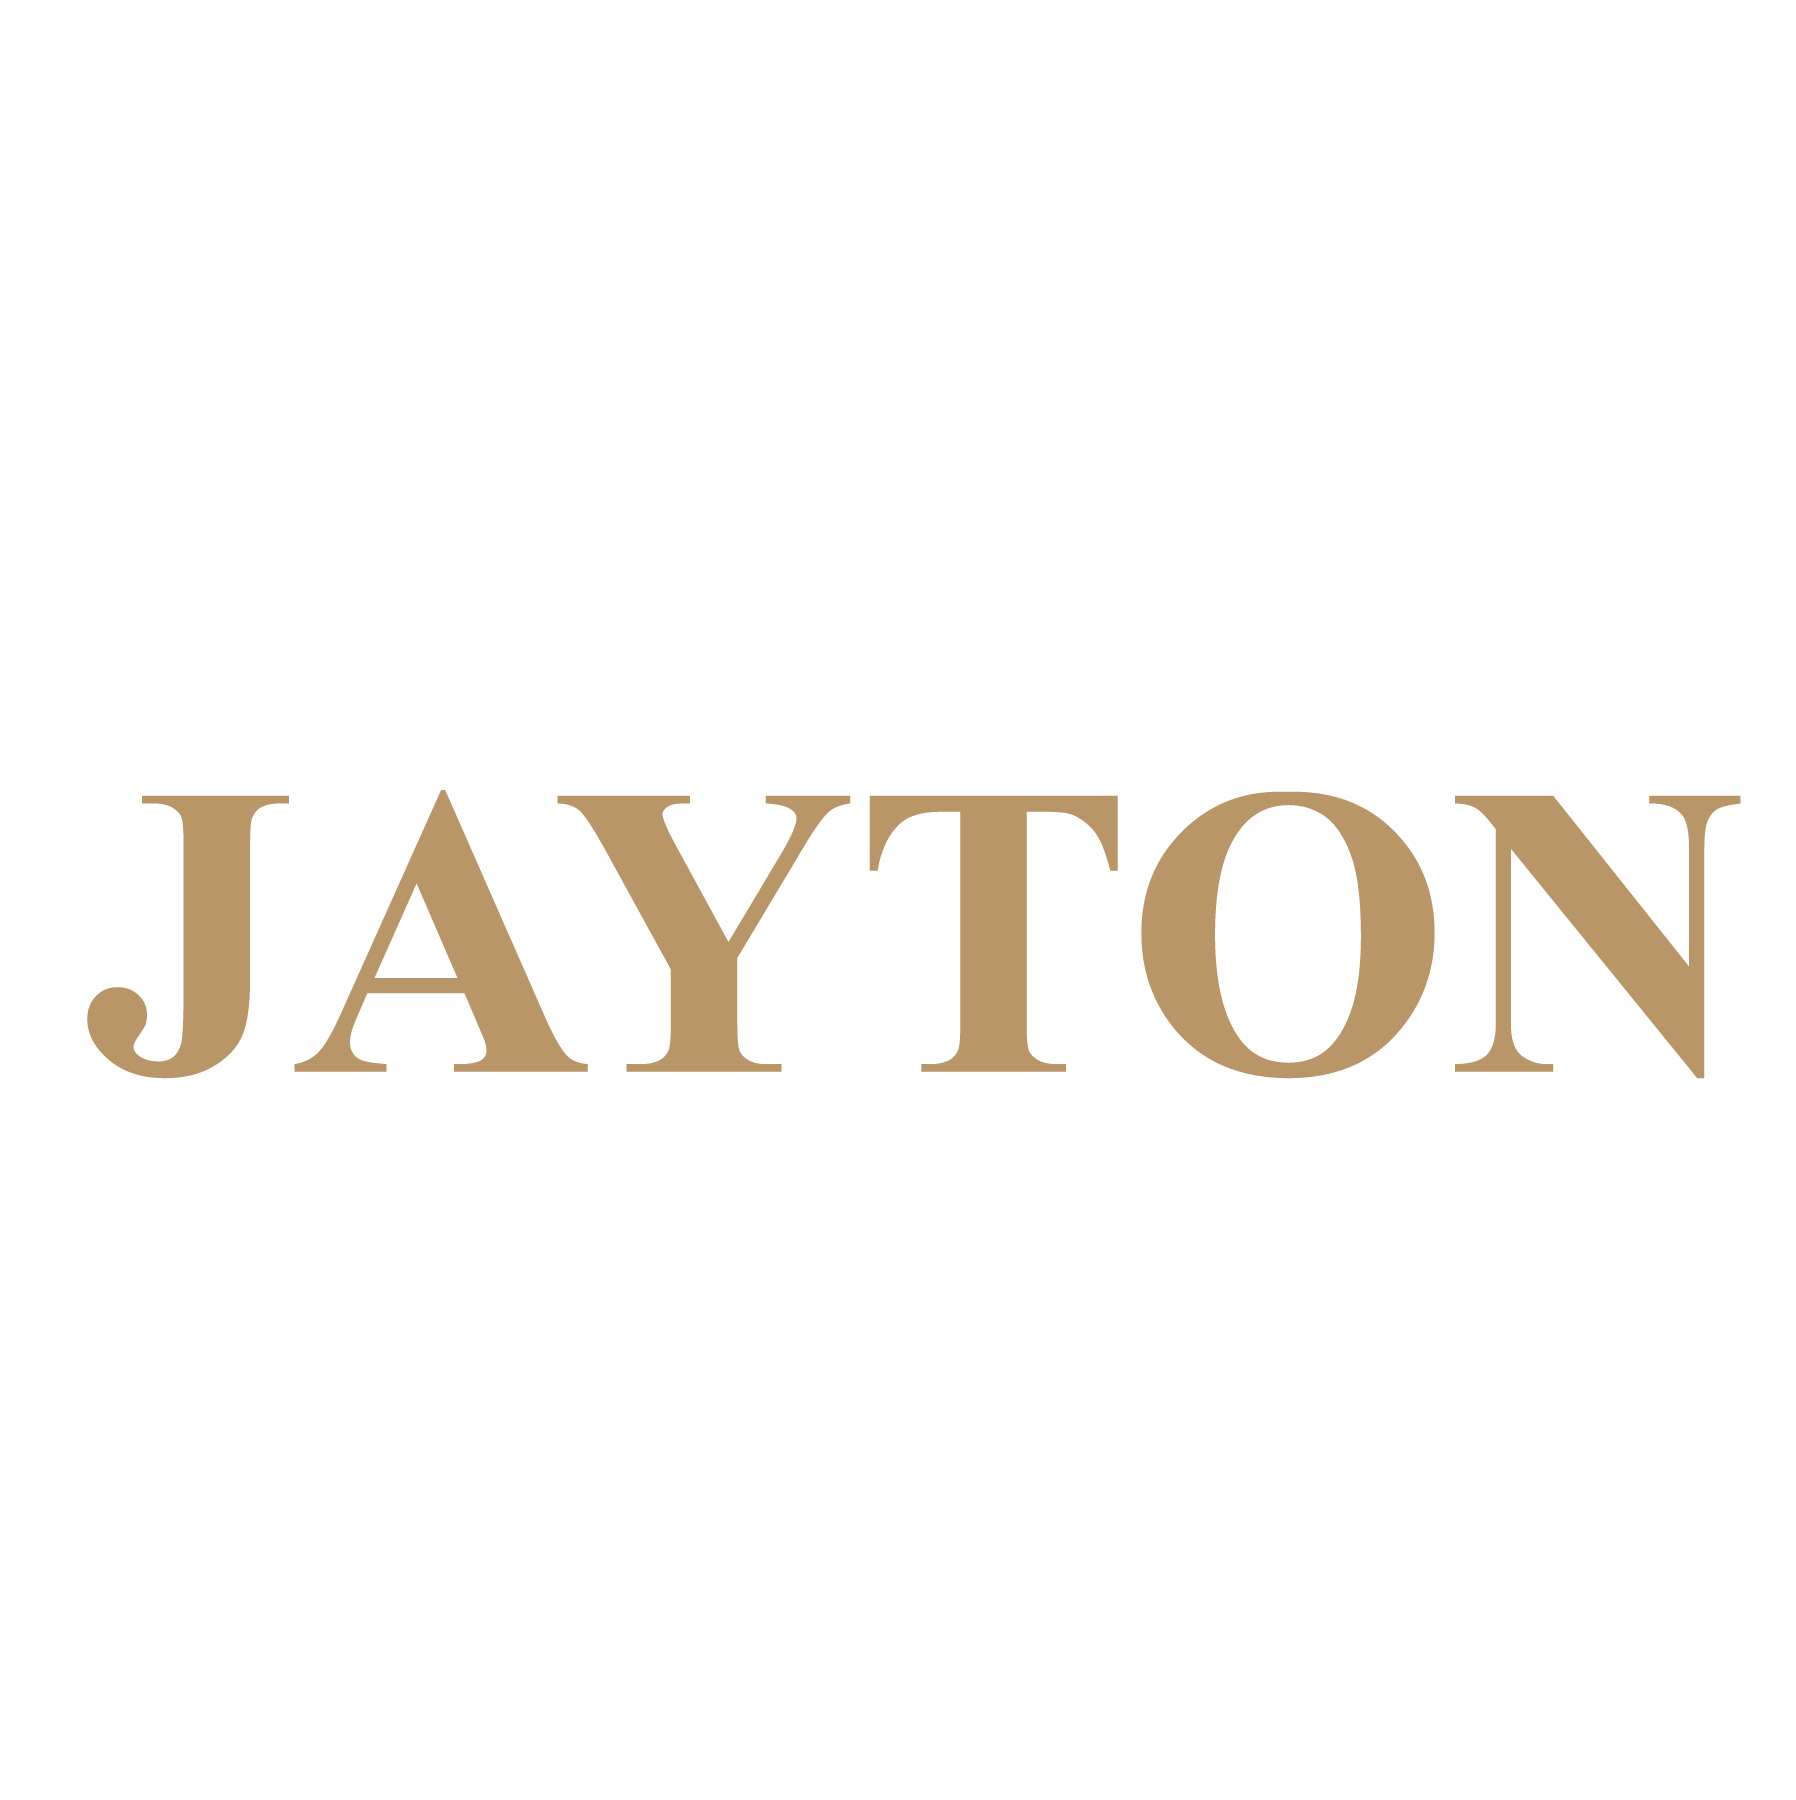 Jayton